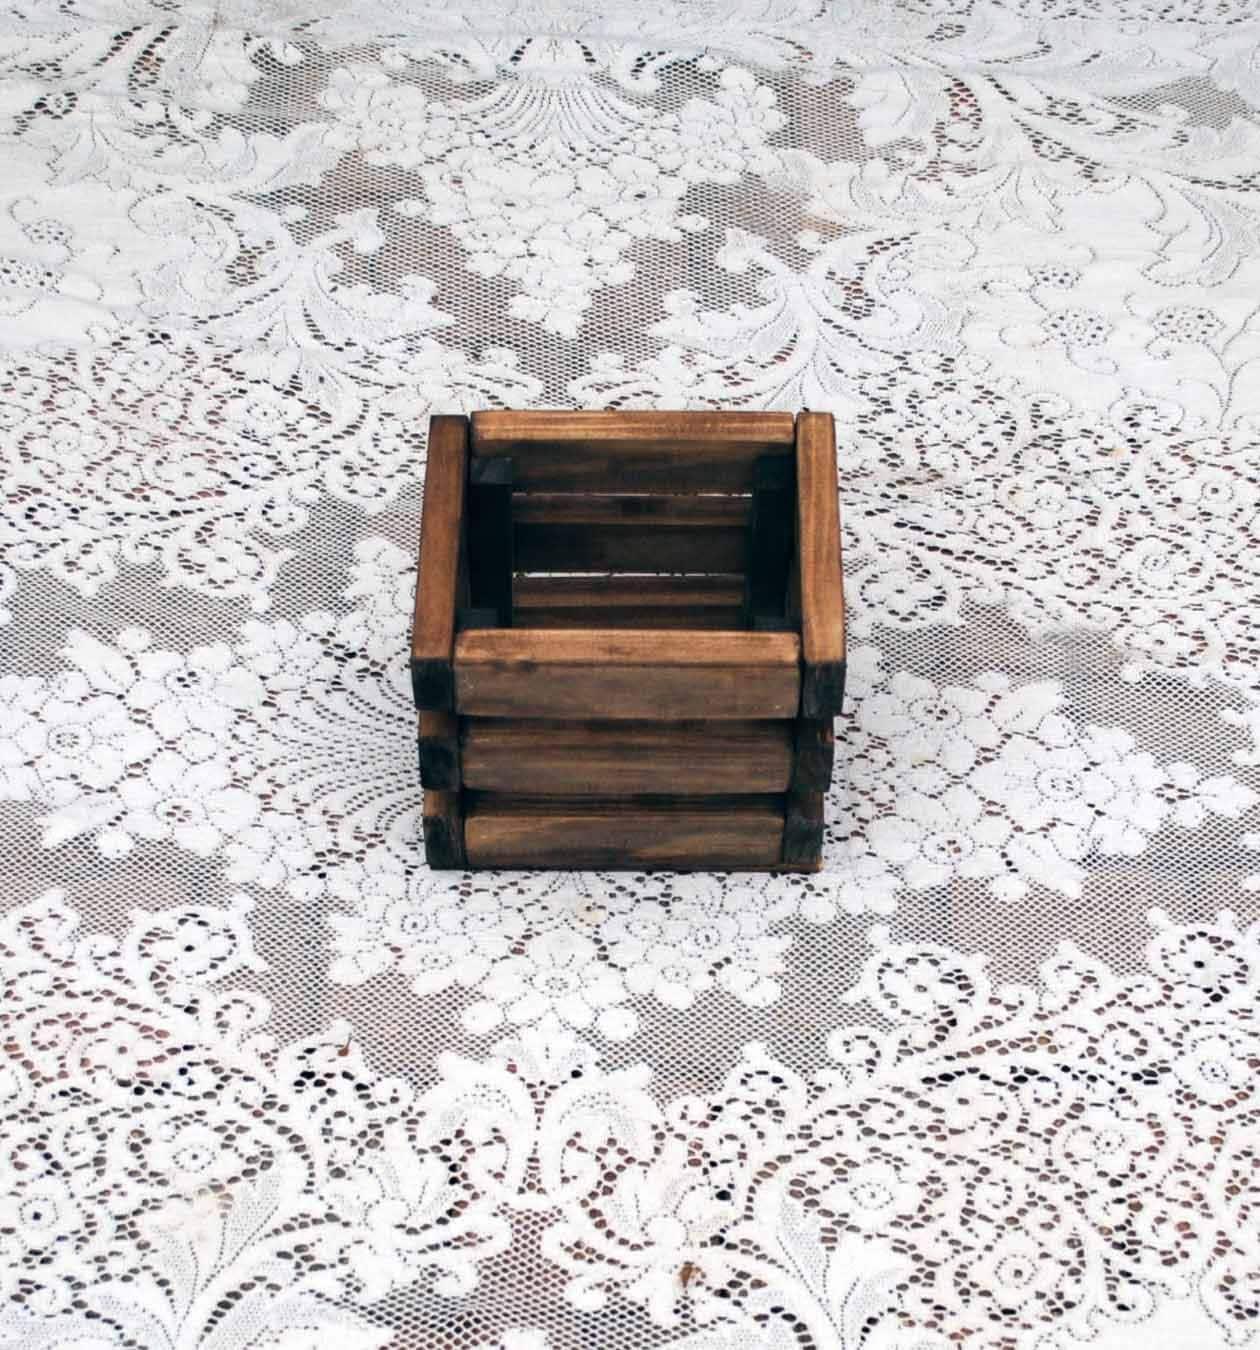 Wood Rustic Wedding Centerpiece Small Panel Box Vase ...